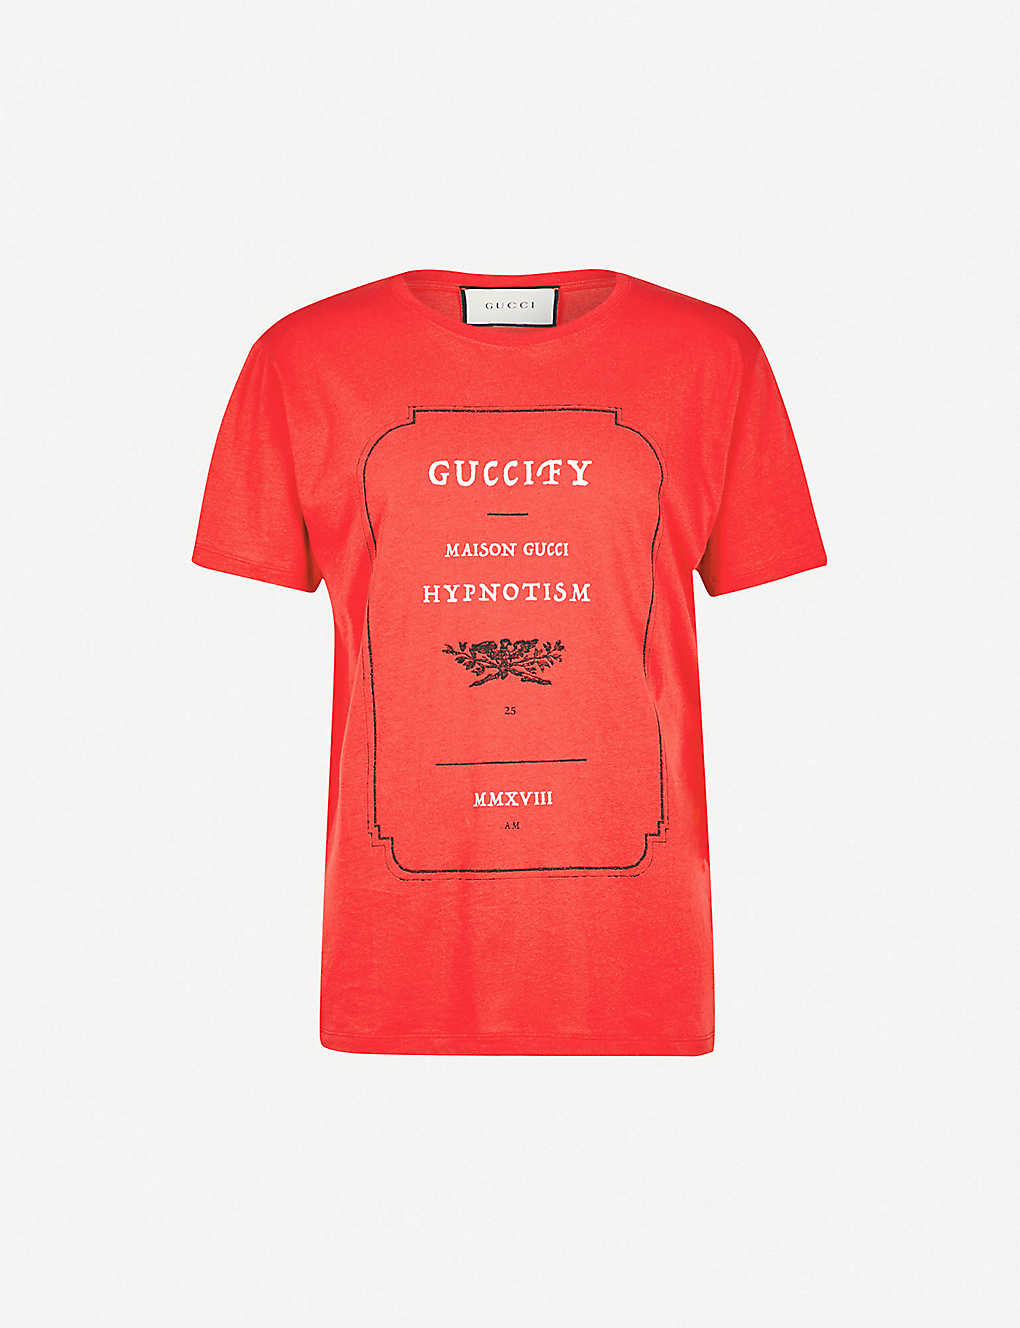 e54a7bbf186b GUCCI - Guccify-print cotton-jersey T-shirt | Selfridges.com